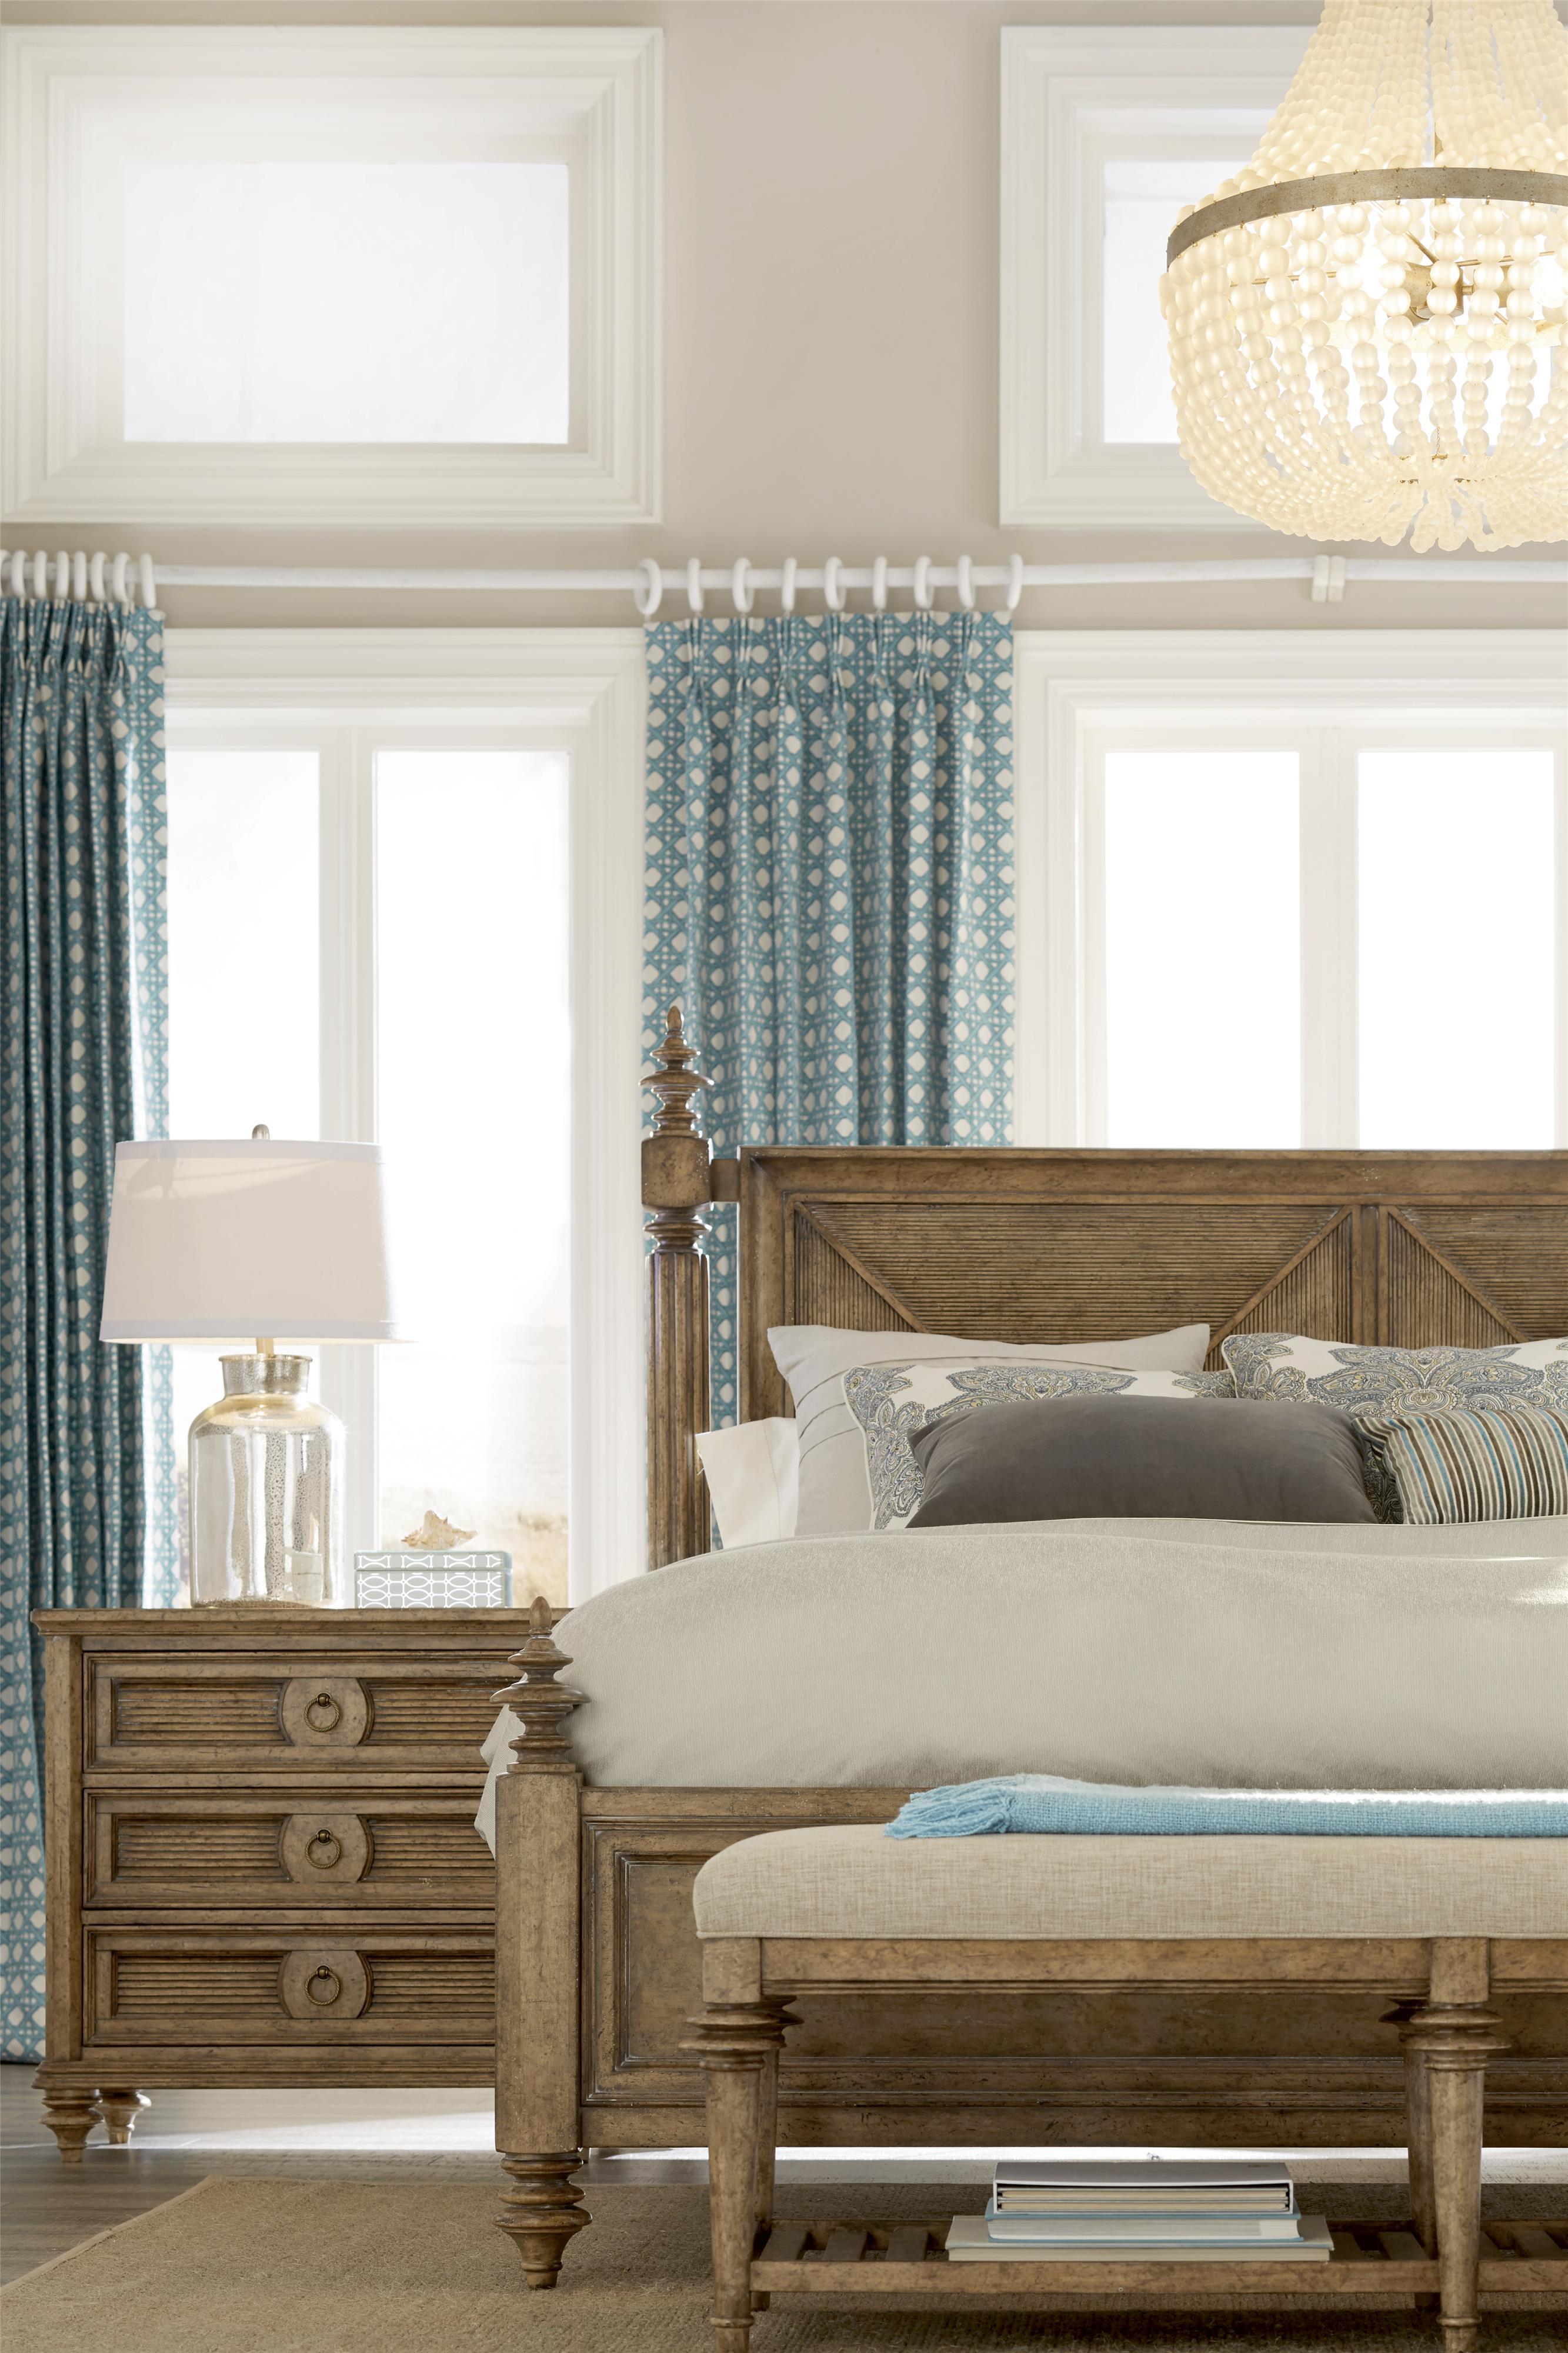 A.R.T. Furniture Inc Pavilion Queen Bedroom Group - Item Number: 229000-2608 Q Bedroom Group 4